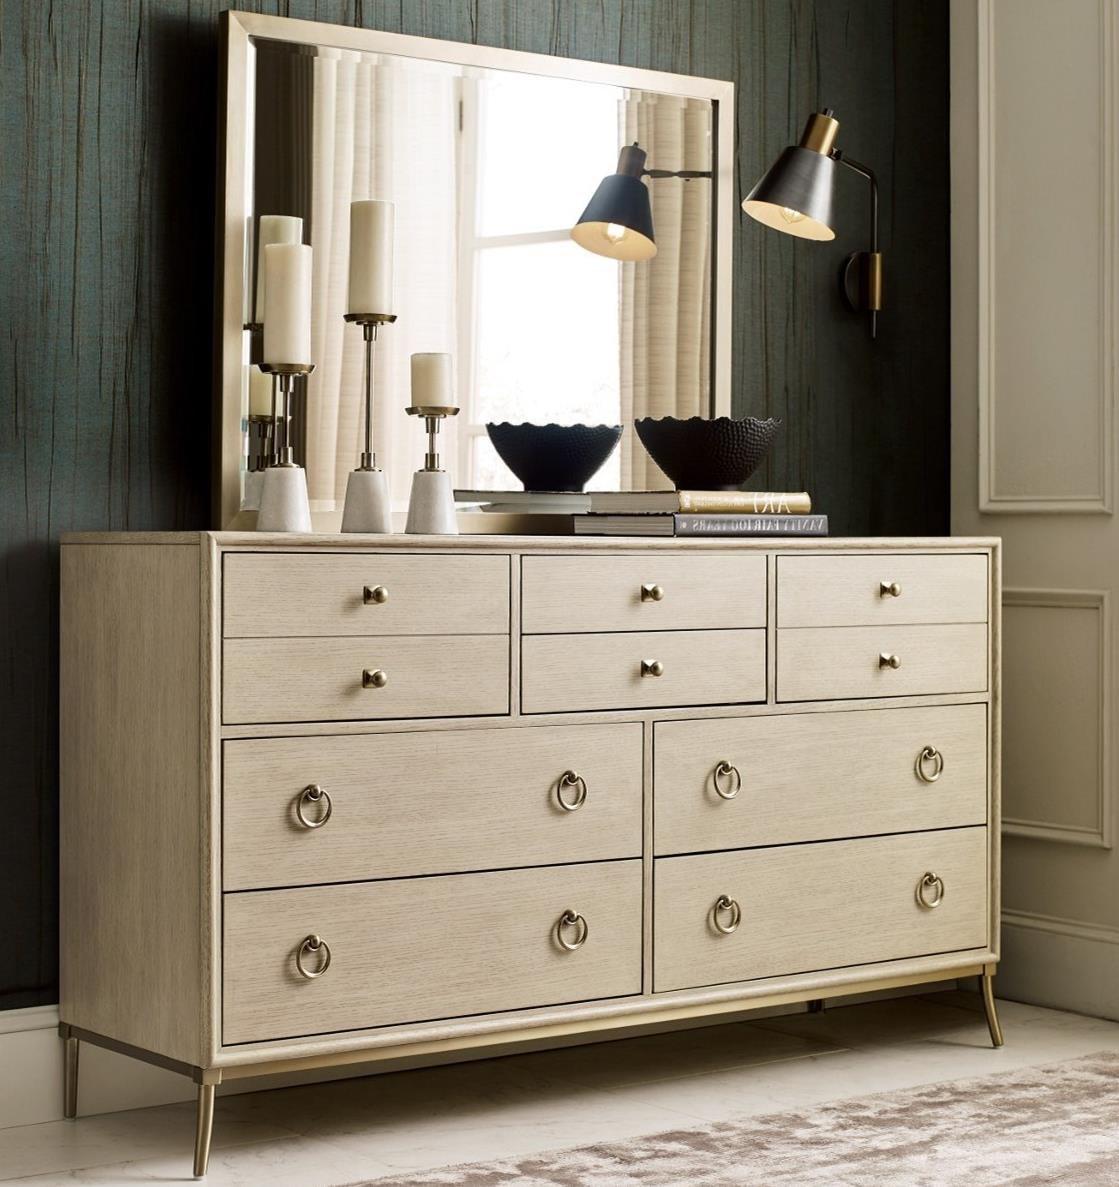 Lenox Dresser + Mirror Set by American Drew at Northeast Factory Direct